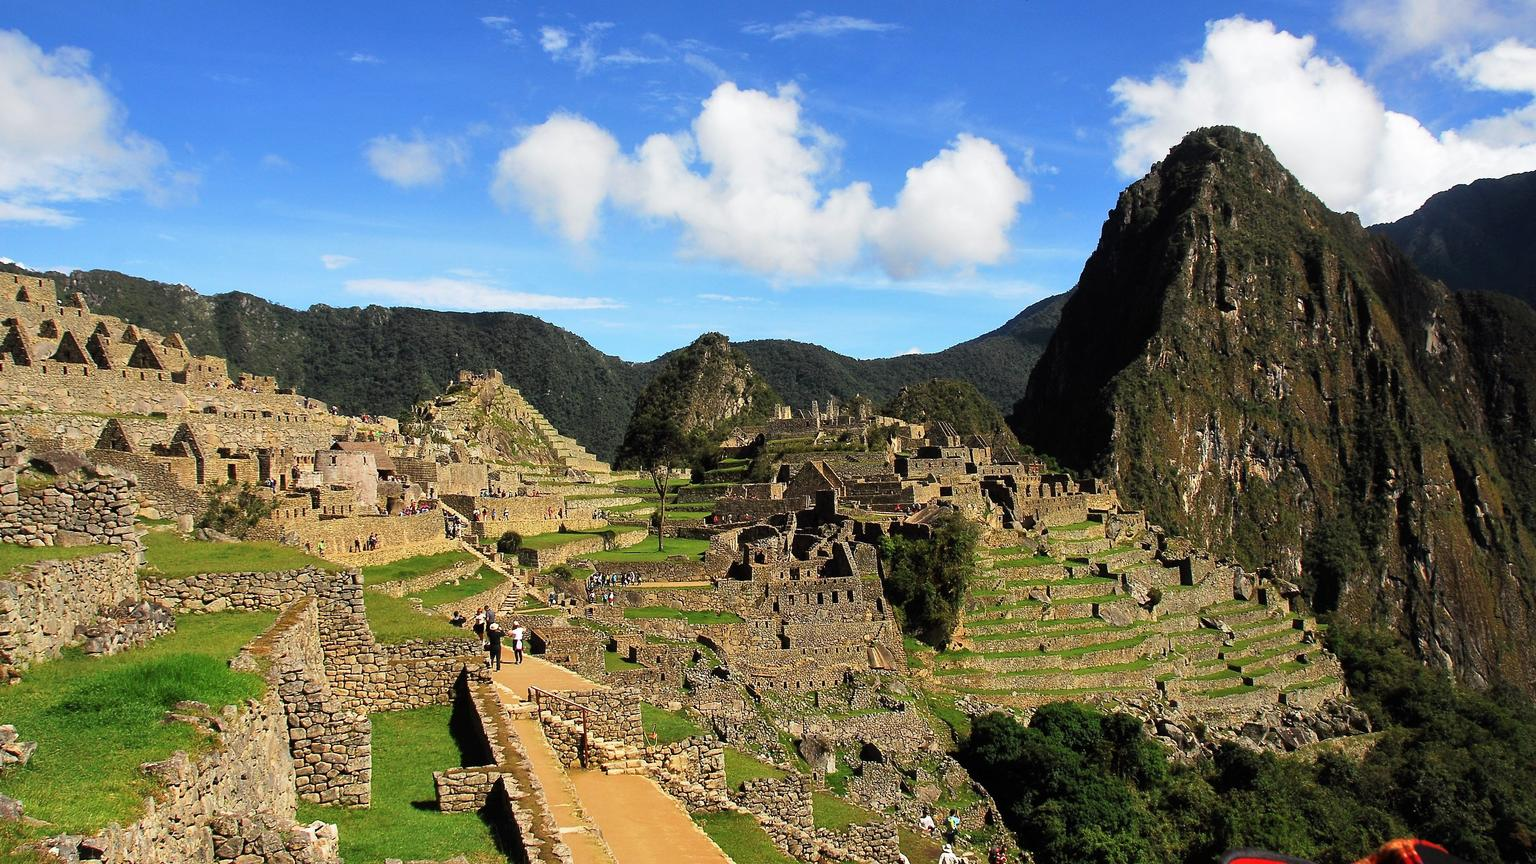 MORE PHOTOS, 4-Day Trek to Machu Picchu Through the Inca Trail